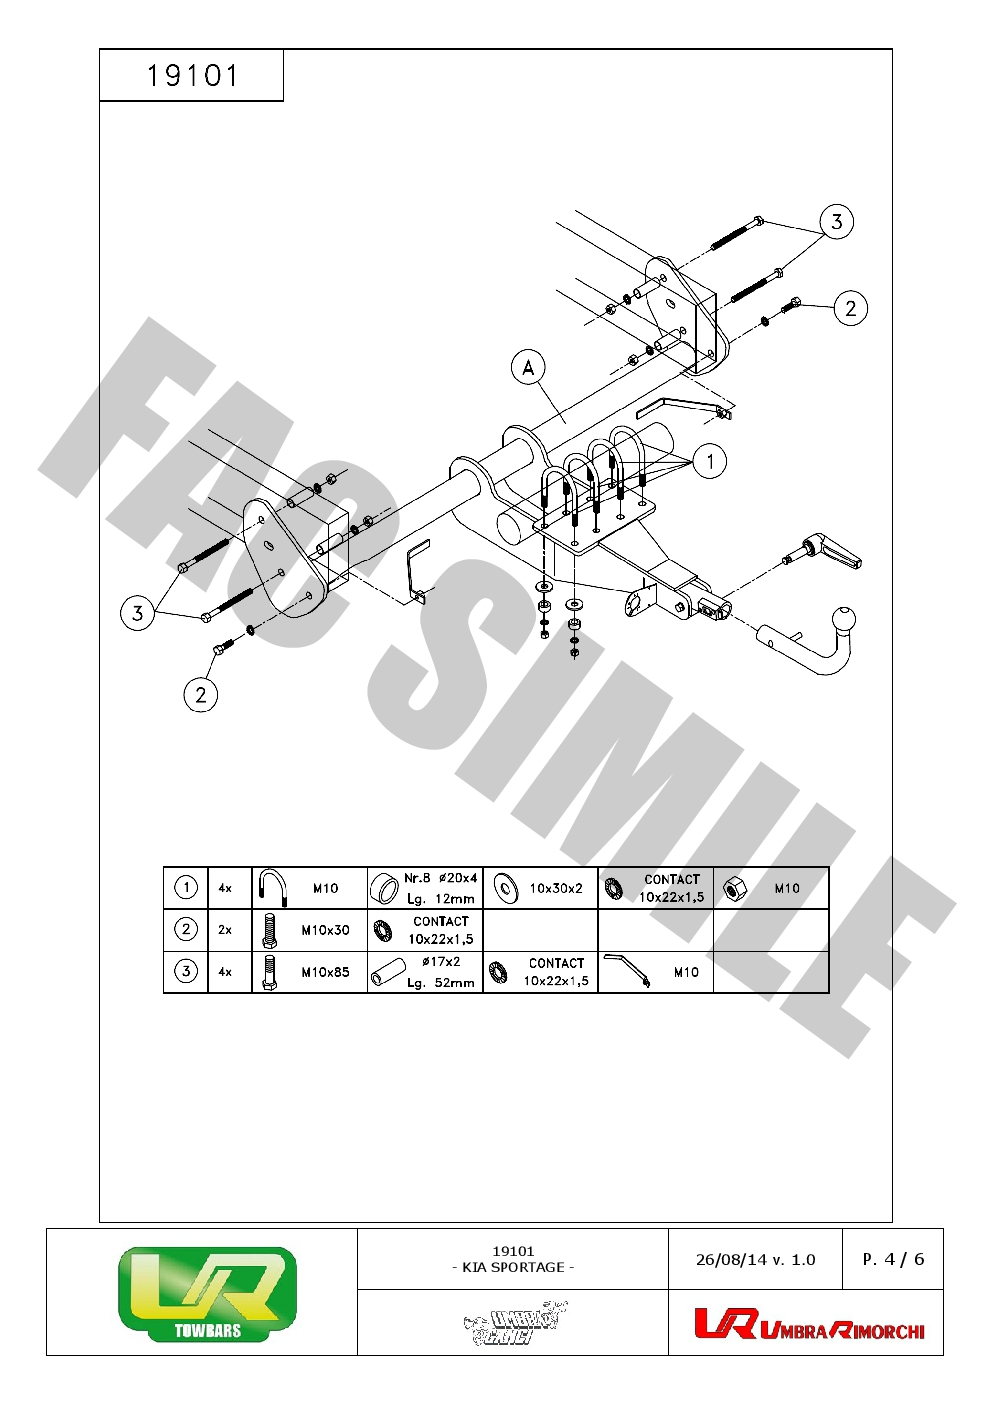 Detachable Towbar 13p C2 Wiring For Kia Sportage Suv 4wd 2